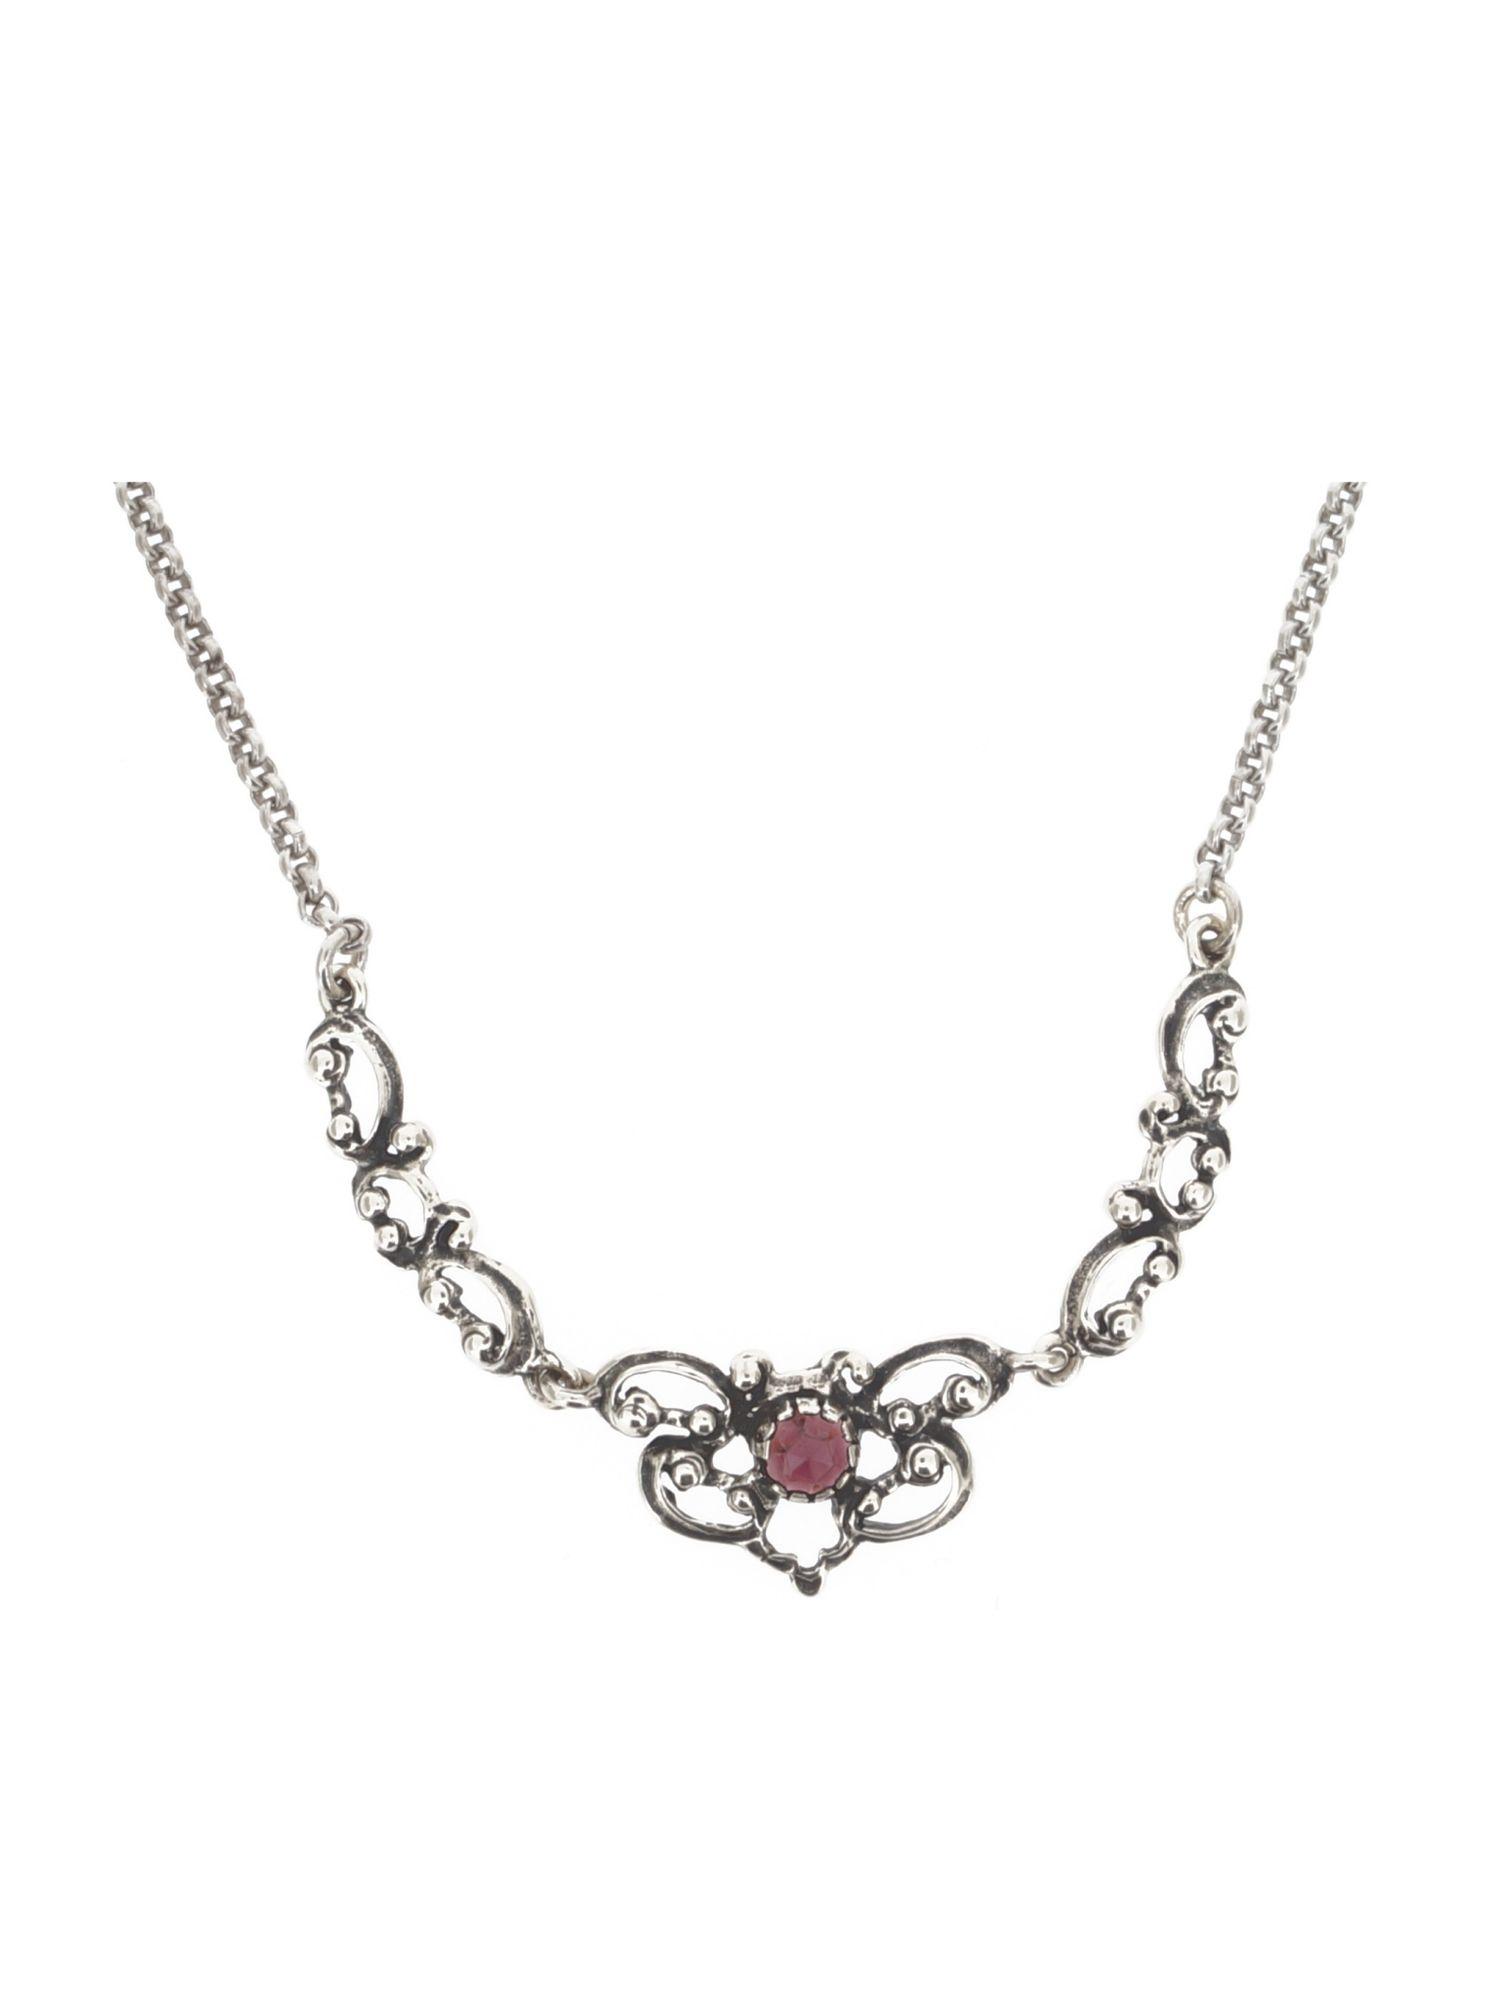 Gerry Eder 1045 Damen Collier Sterling-Silber 925 Silber Rot 48 cm